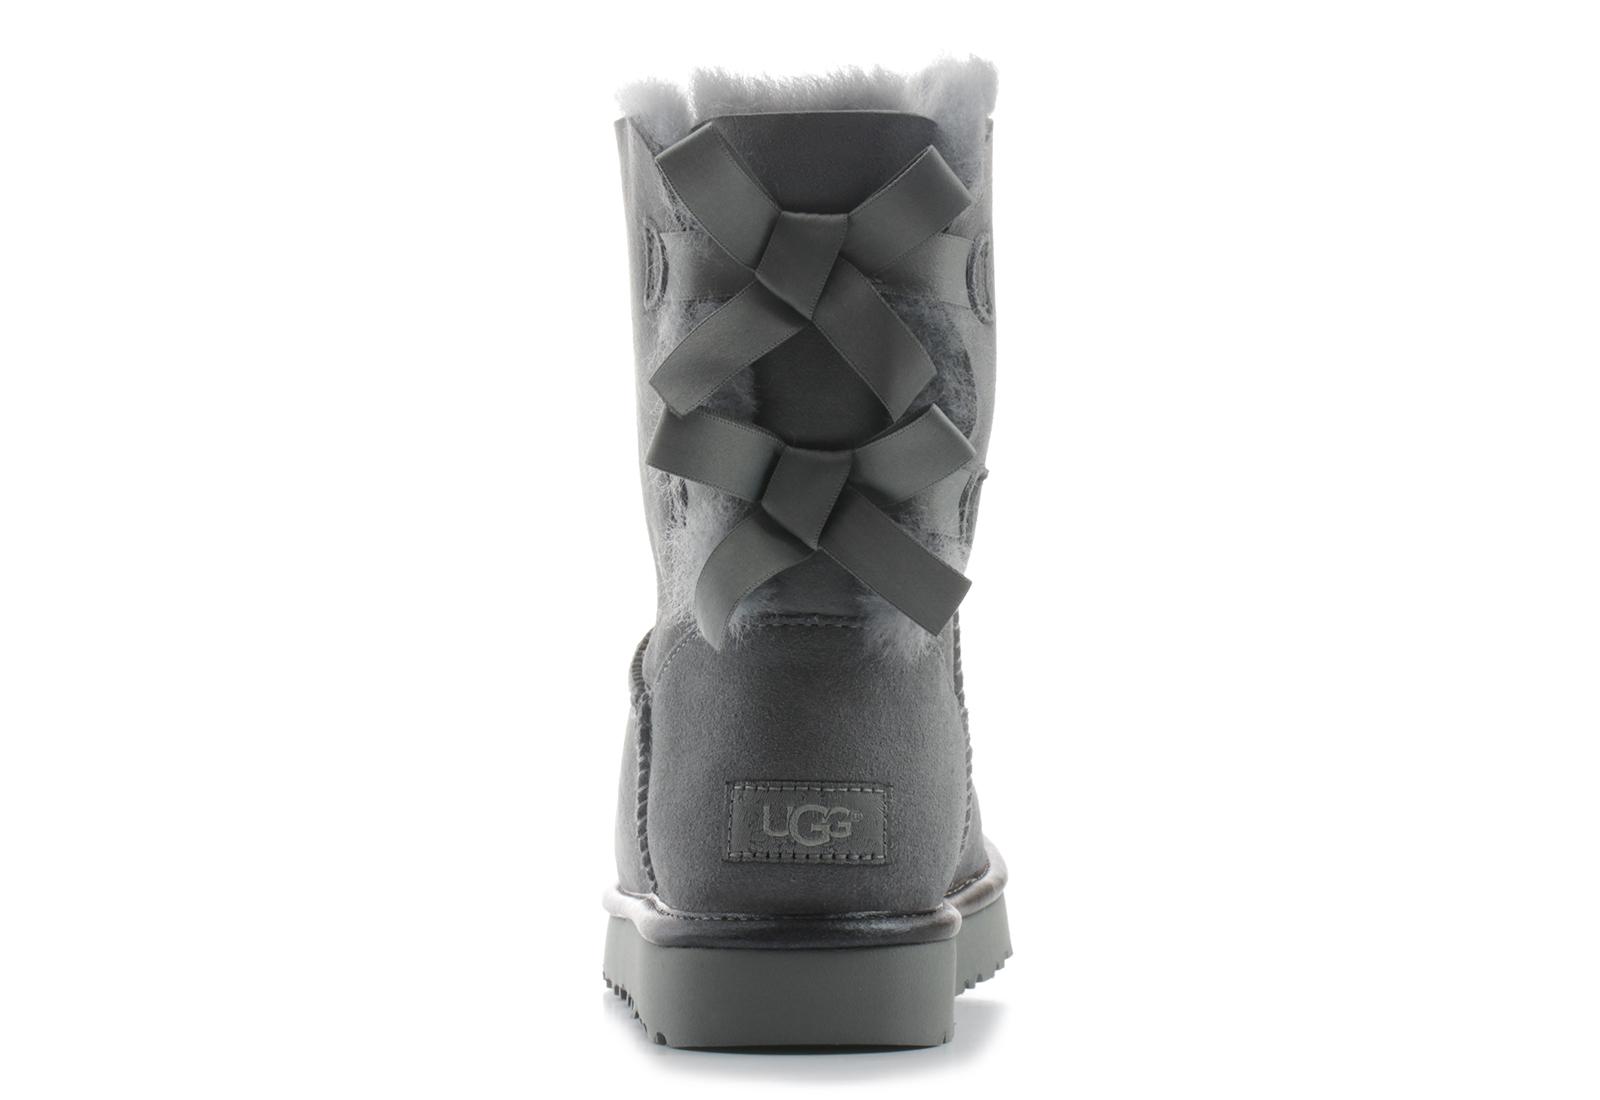 a30a3db4545 uk cizme ugg bailey button metalic black b7d05 66fa9